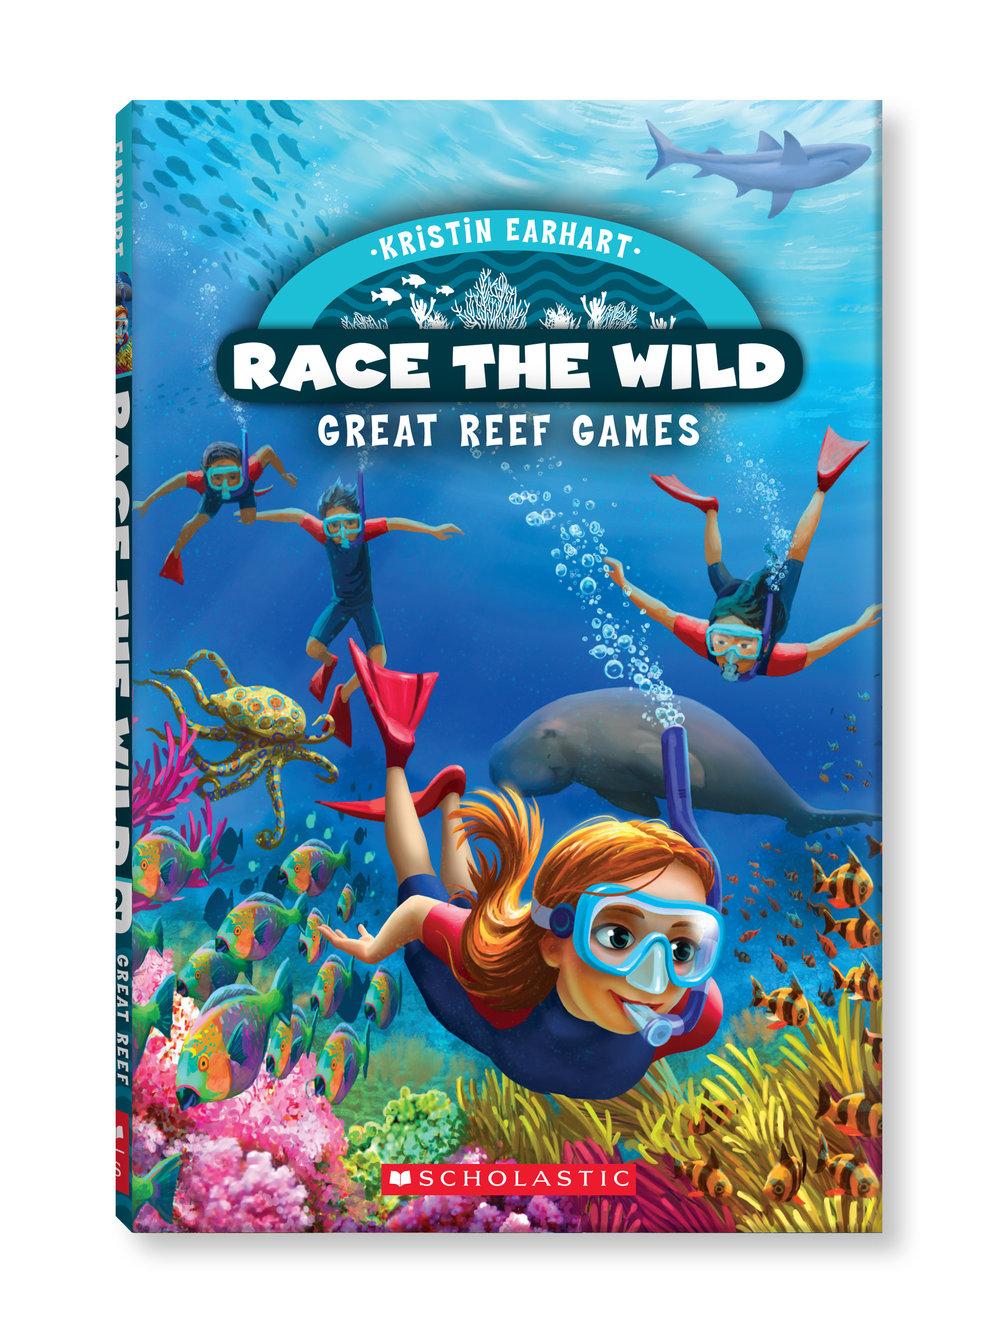 racethewild_2.jpg